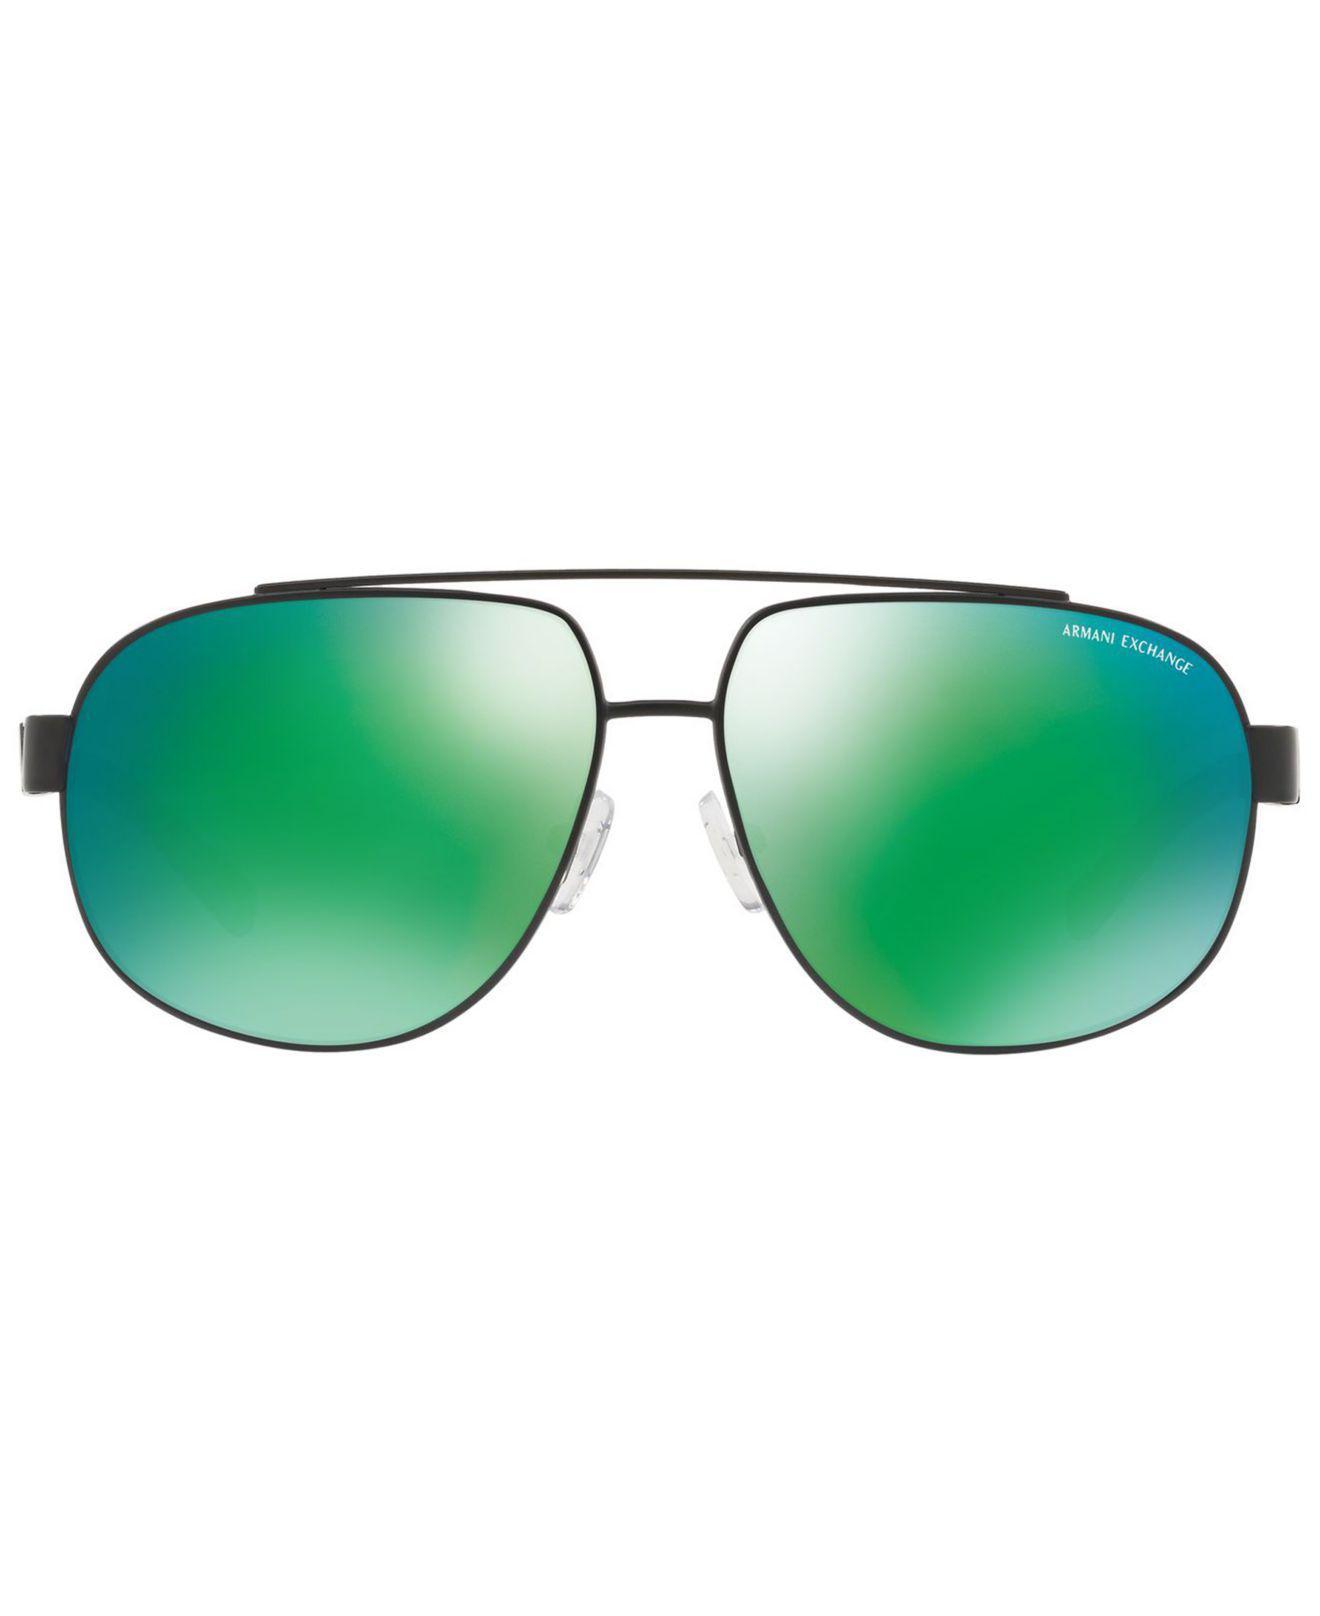 cc325fc35a0 Lyst - Armani Exchange Polarized Sunglasses